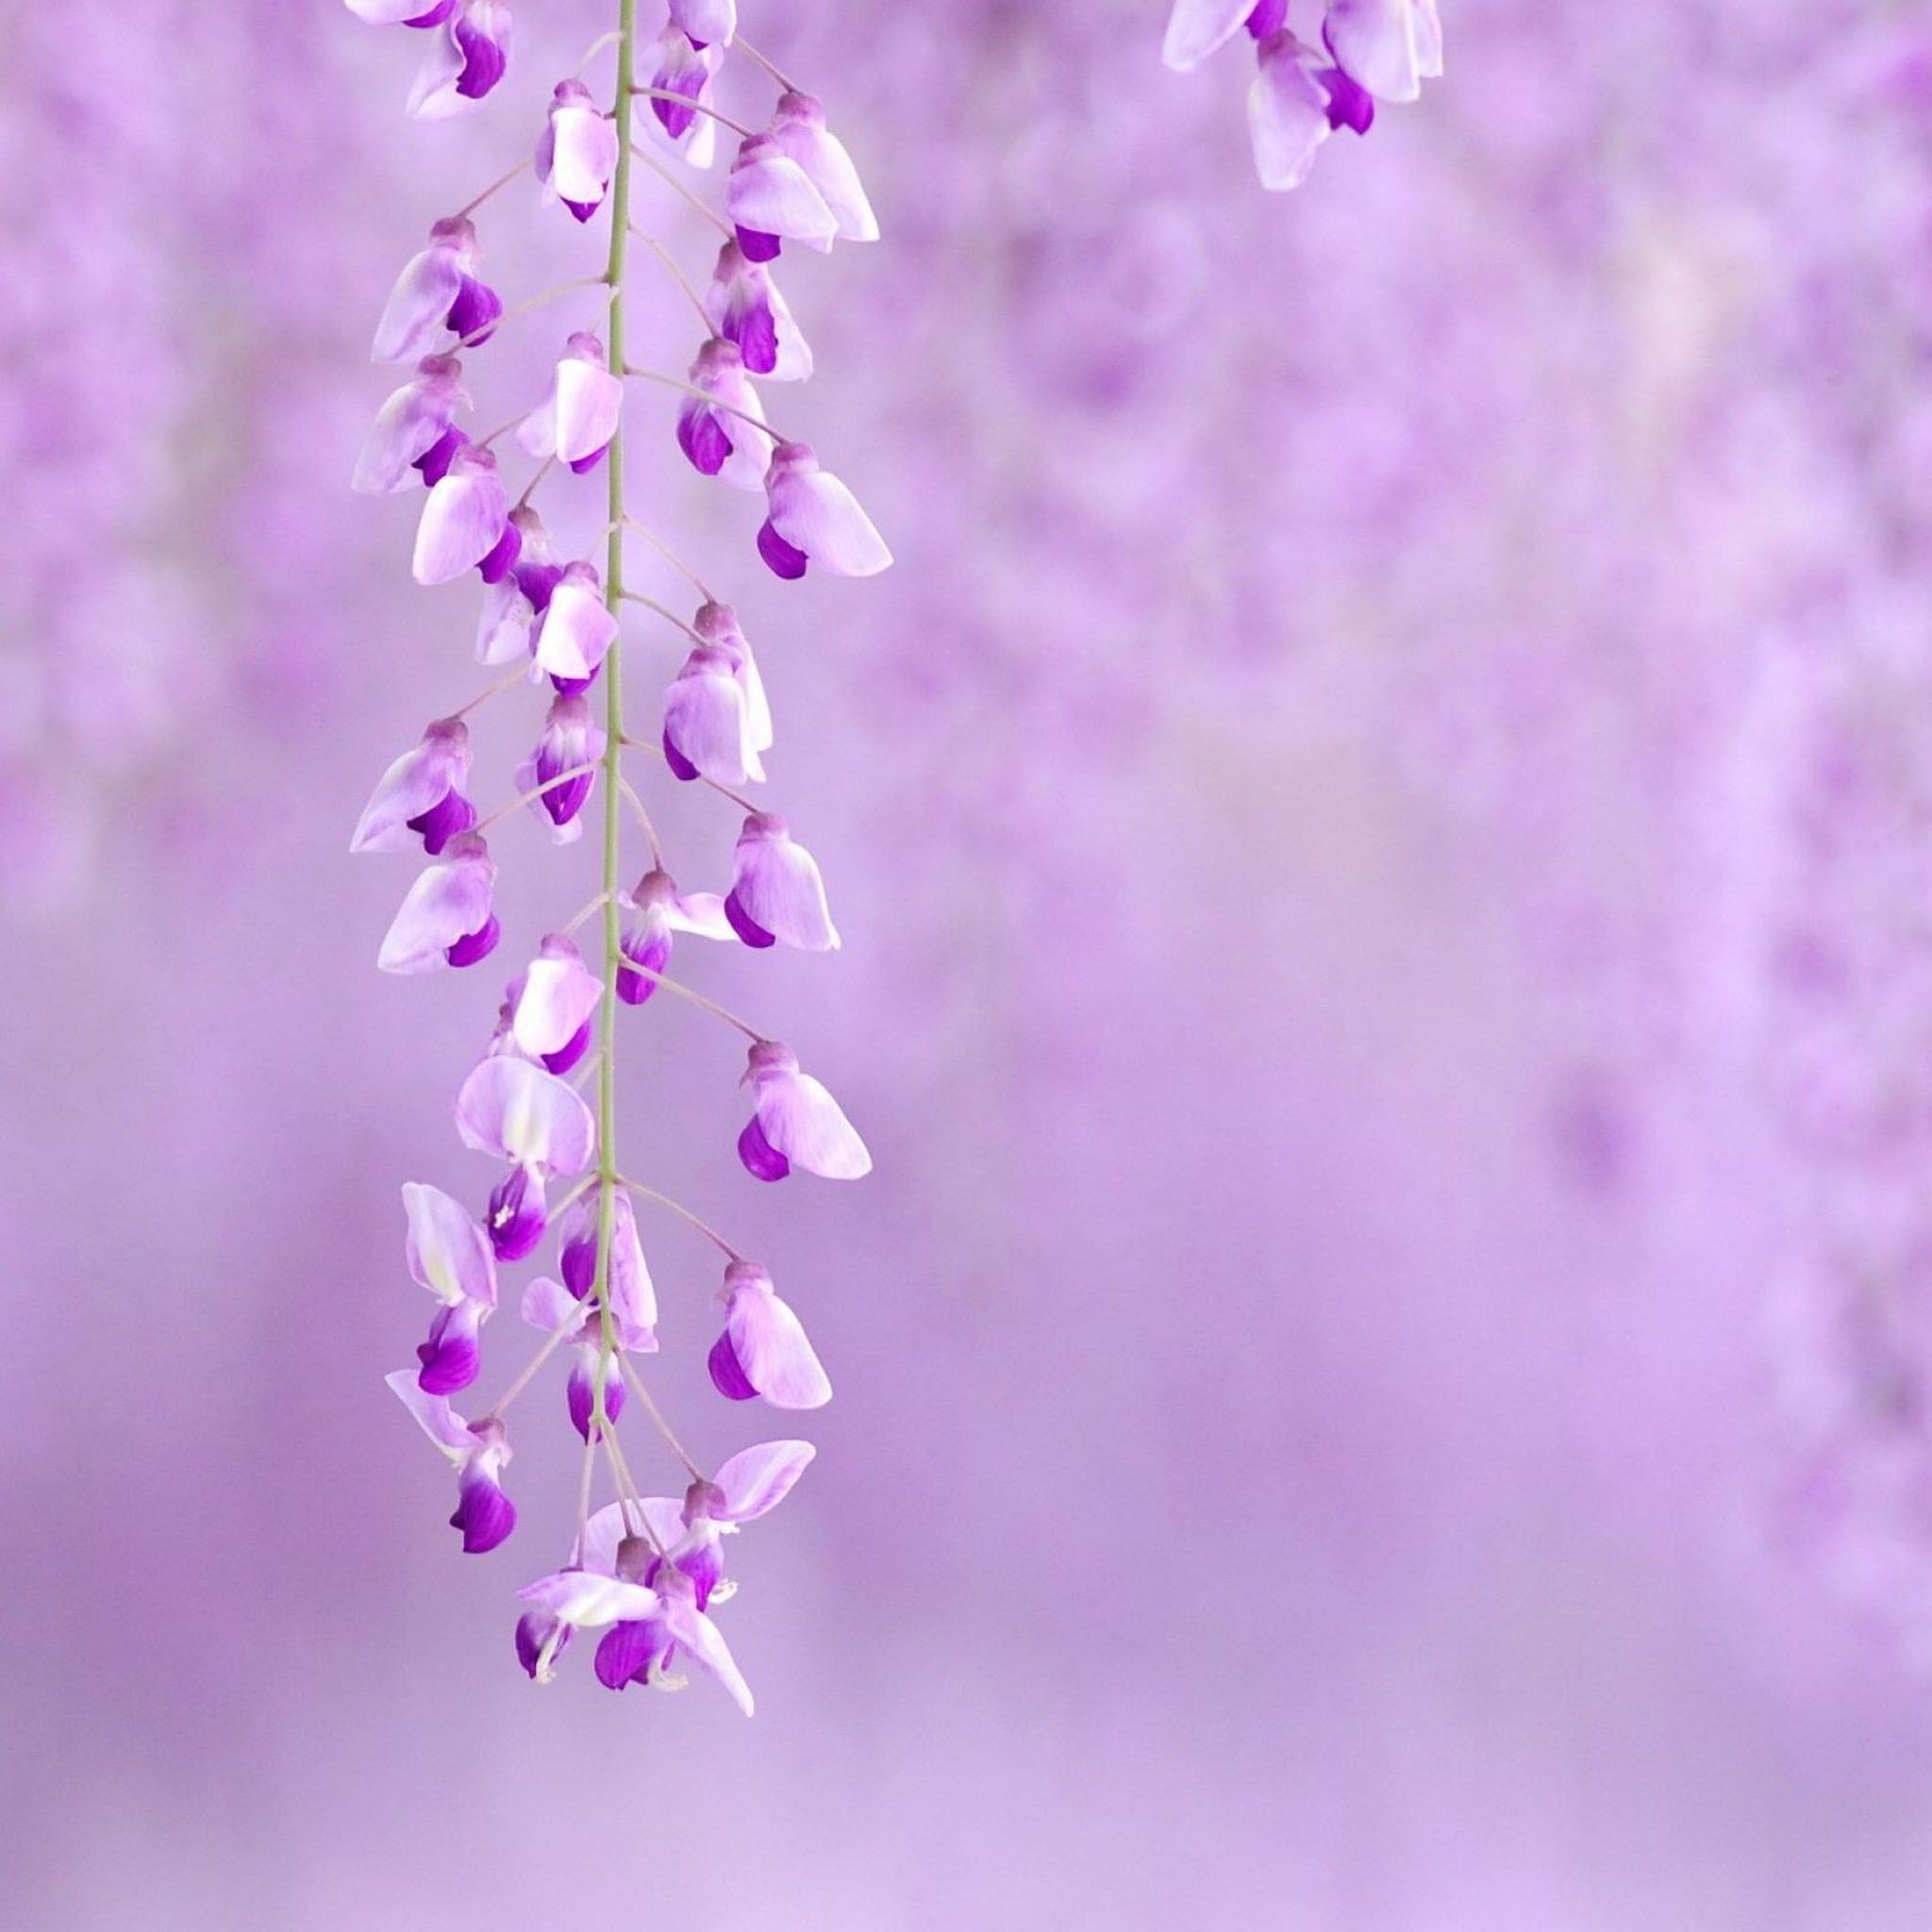 Light Purple Background ·① Download Free Beautiful